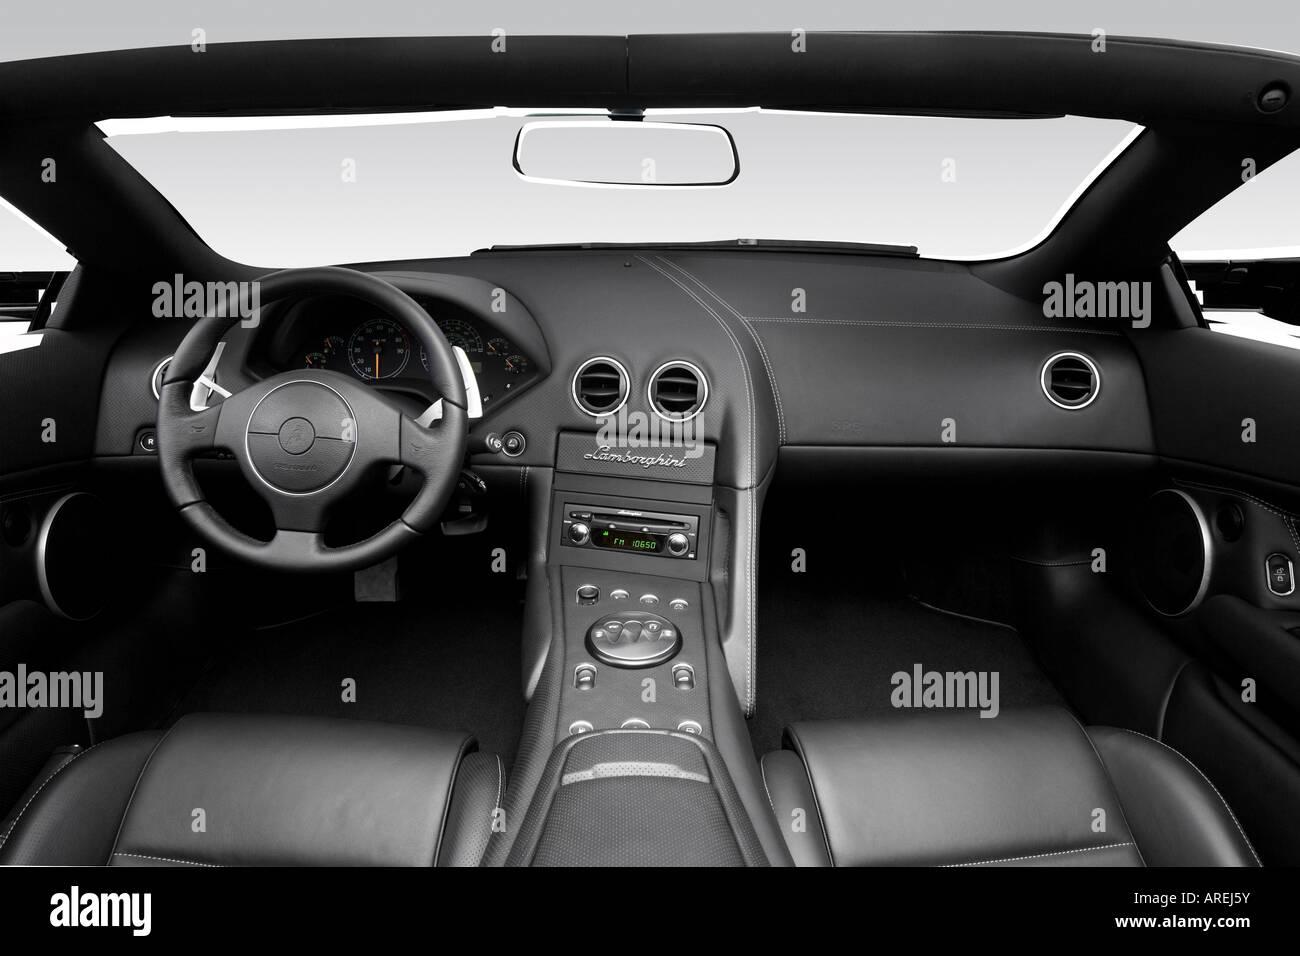 2006 Lamborghini Murcielago Roadster In Gray Dashboard Center